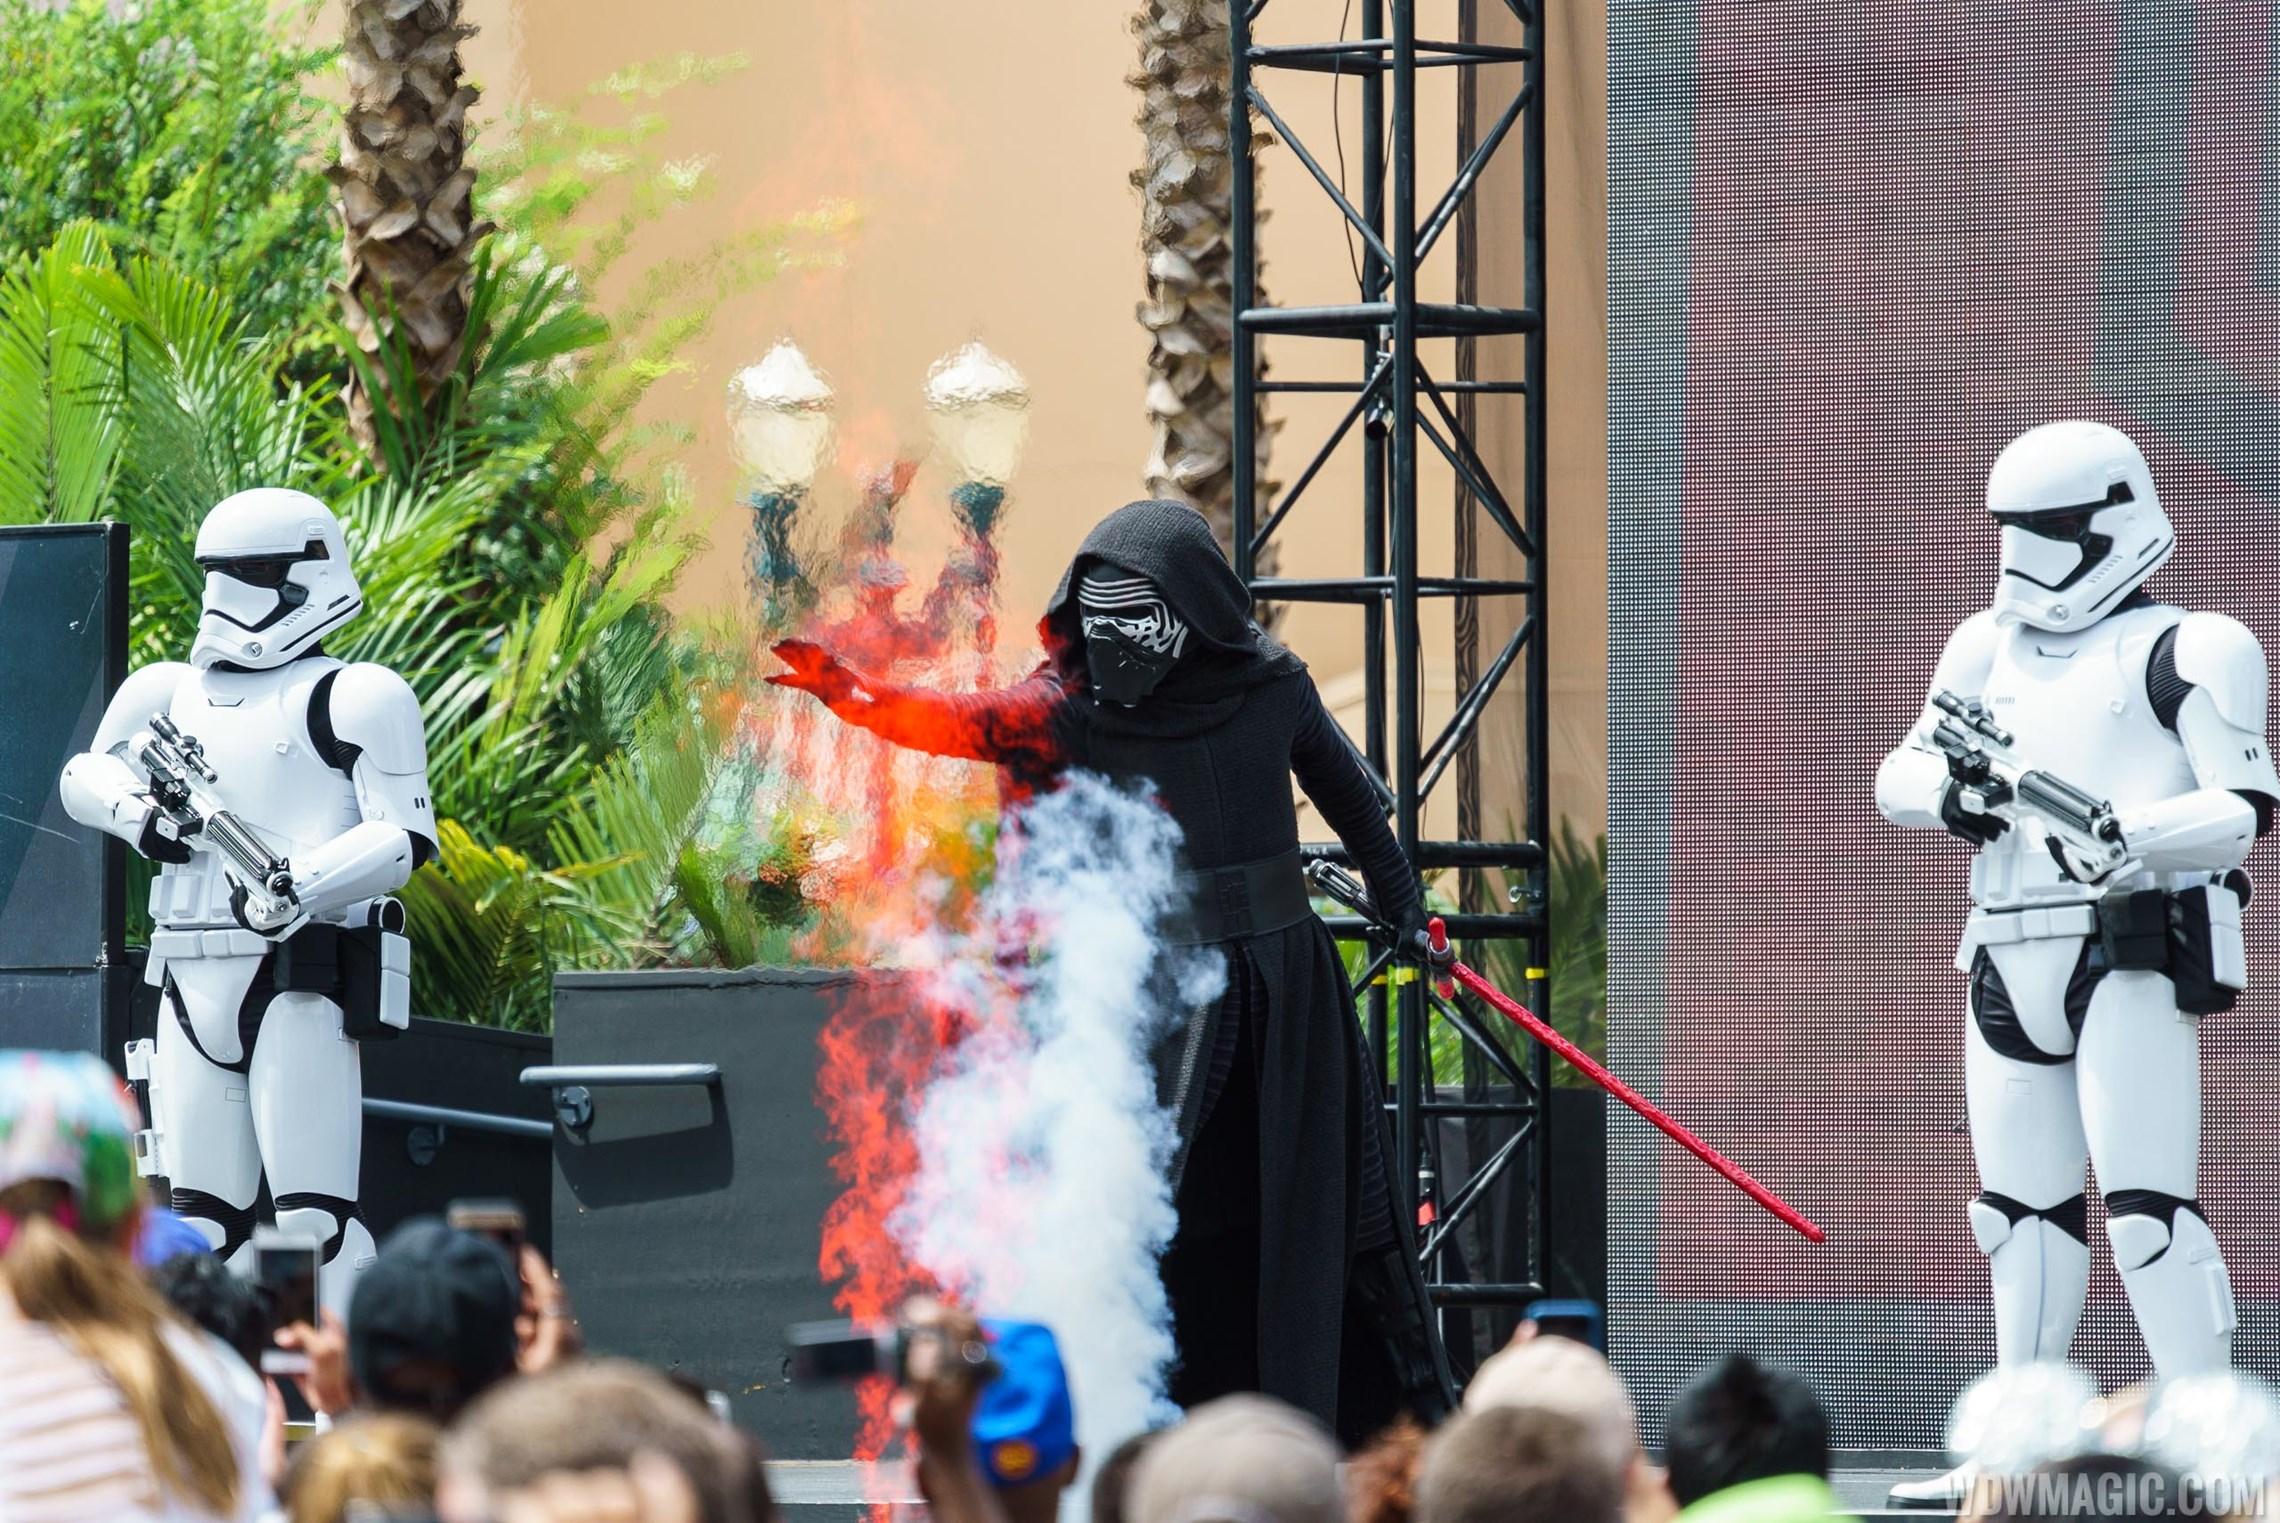 Star Wars A Galaxy Far, Far Away overview